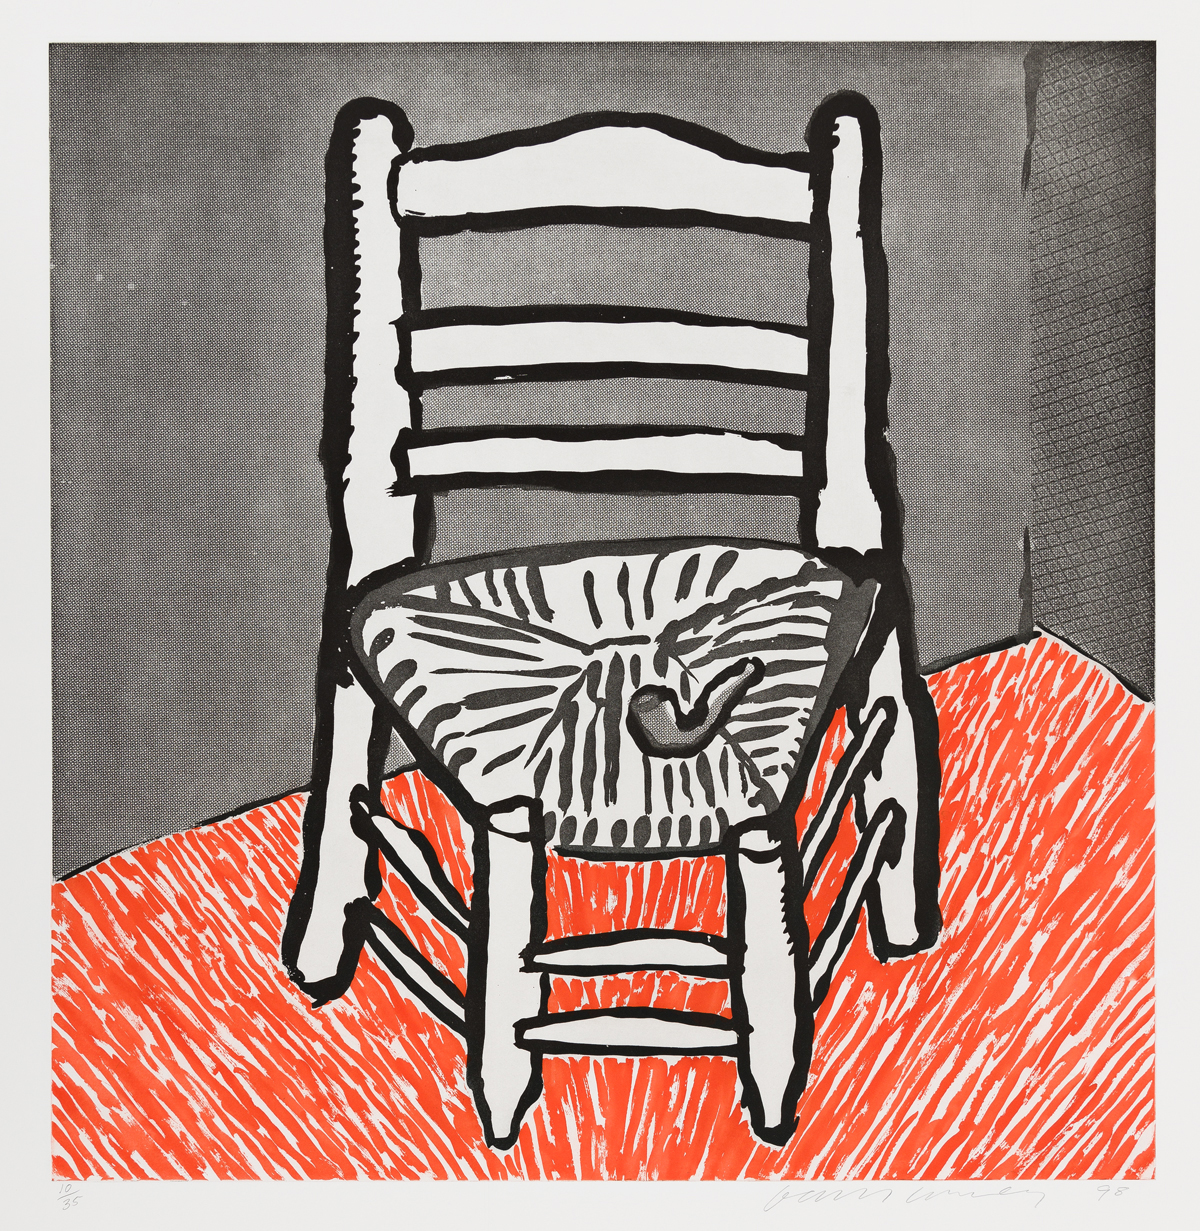 DAVID HOCKNEY Van Gogh Chair (White).